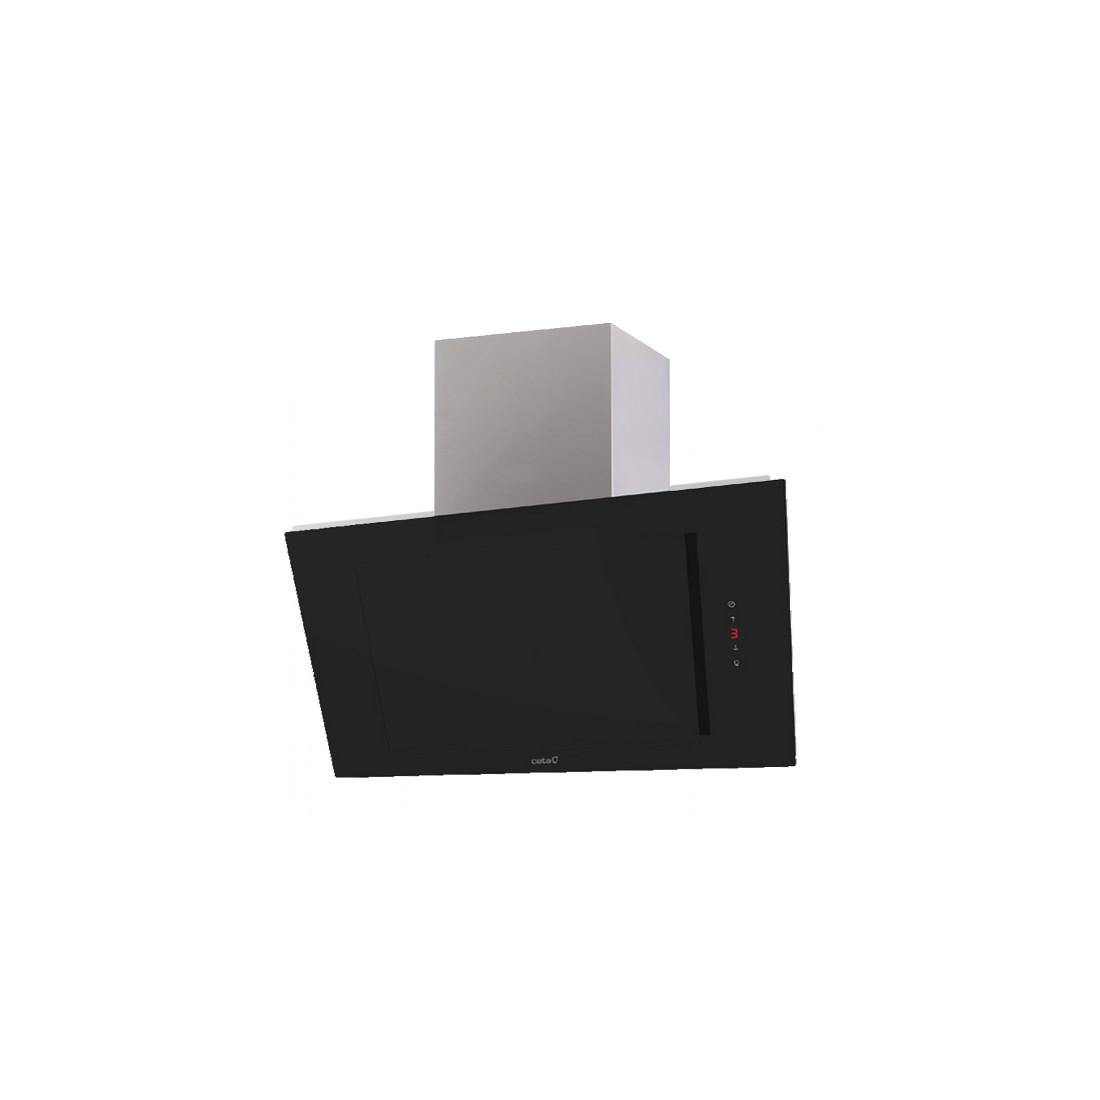 Campana Decorativa - Cata THALASSA 700XGBK Negro, 70 cm